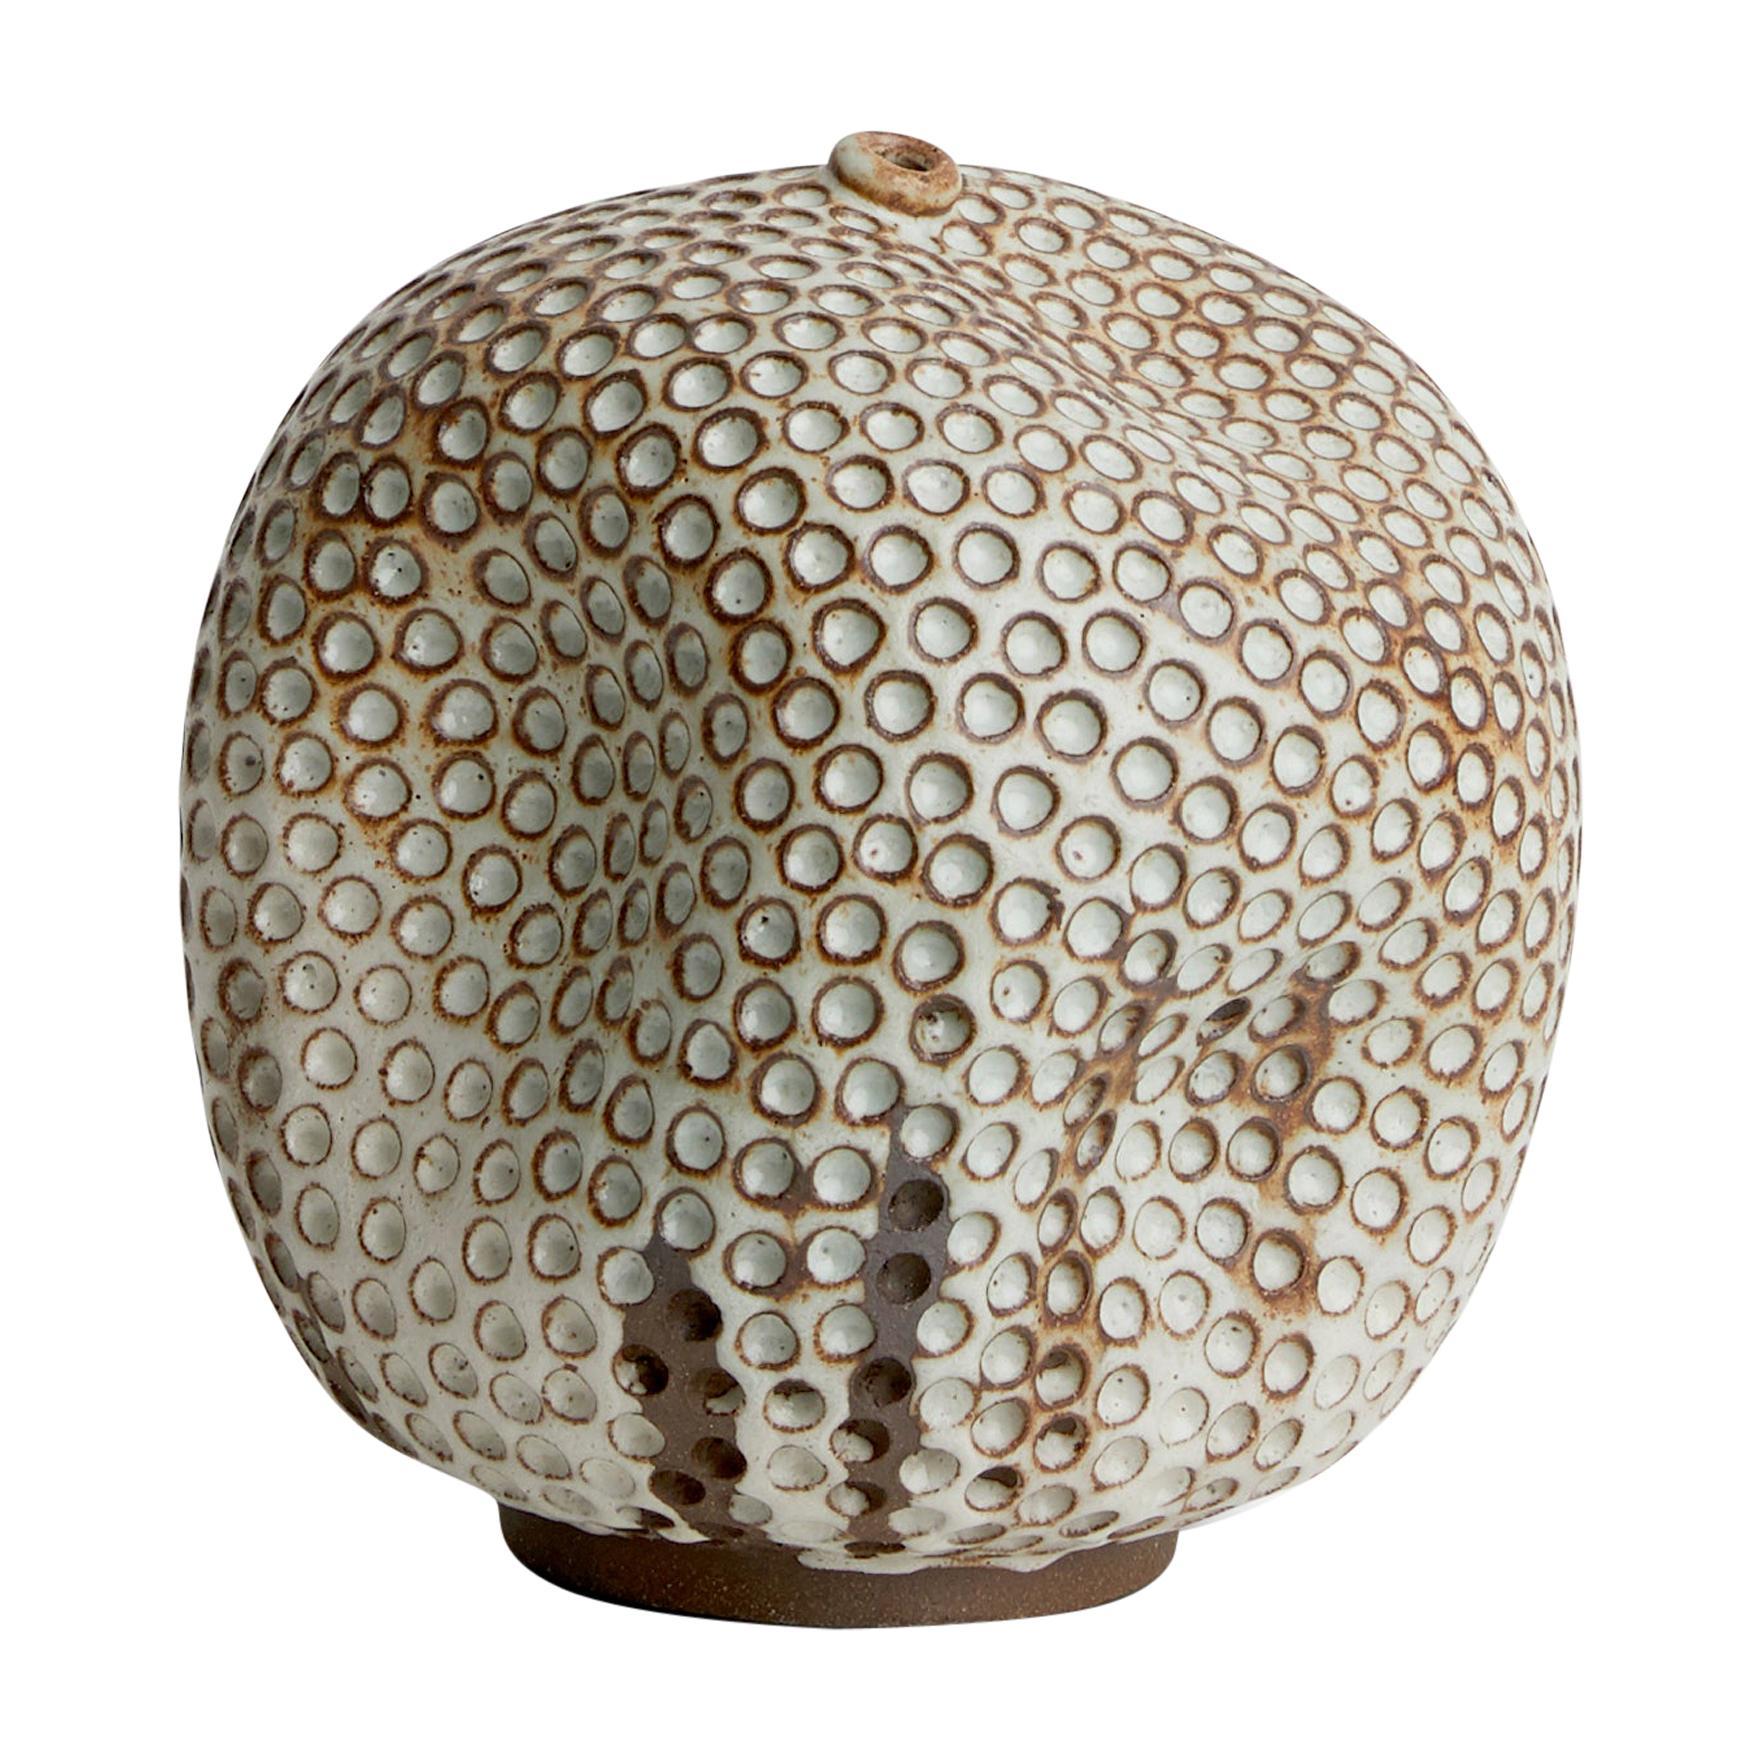 Skoby Joe Textured Handmade Ceramic Vase Wabi Sabi Mid-Century Modern Sculpture